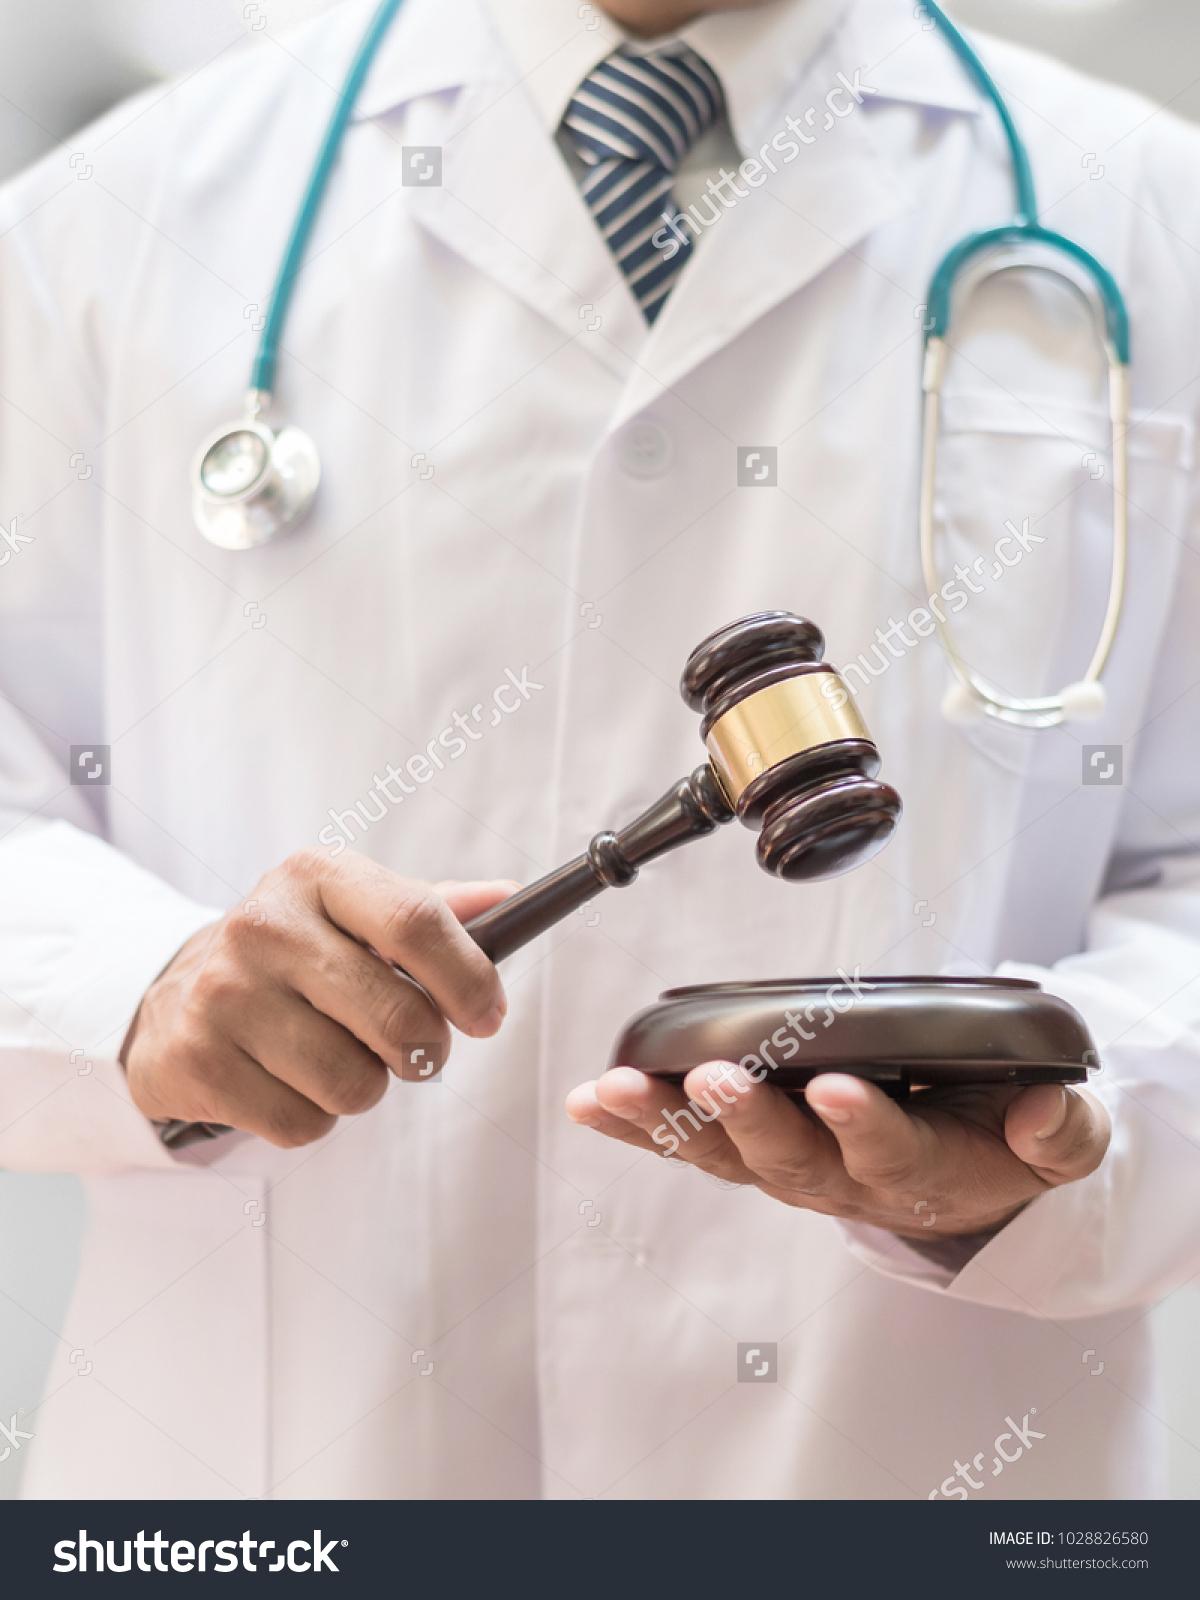 Forensic Medicine Legal Investigation Medical Practice Stock Photo Edit Now 1028826580